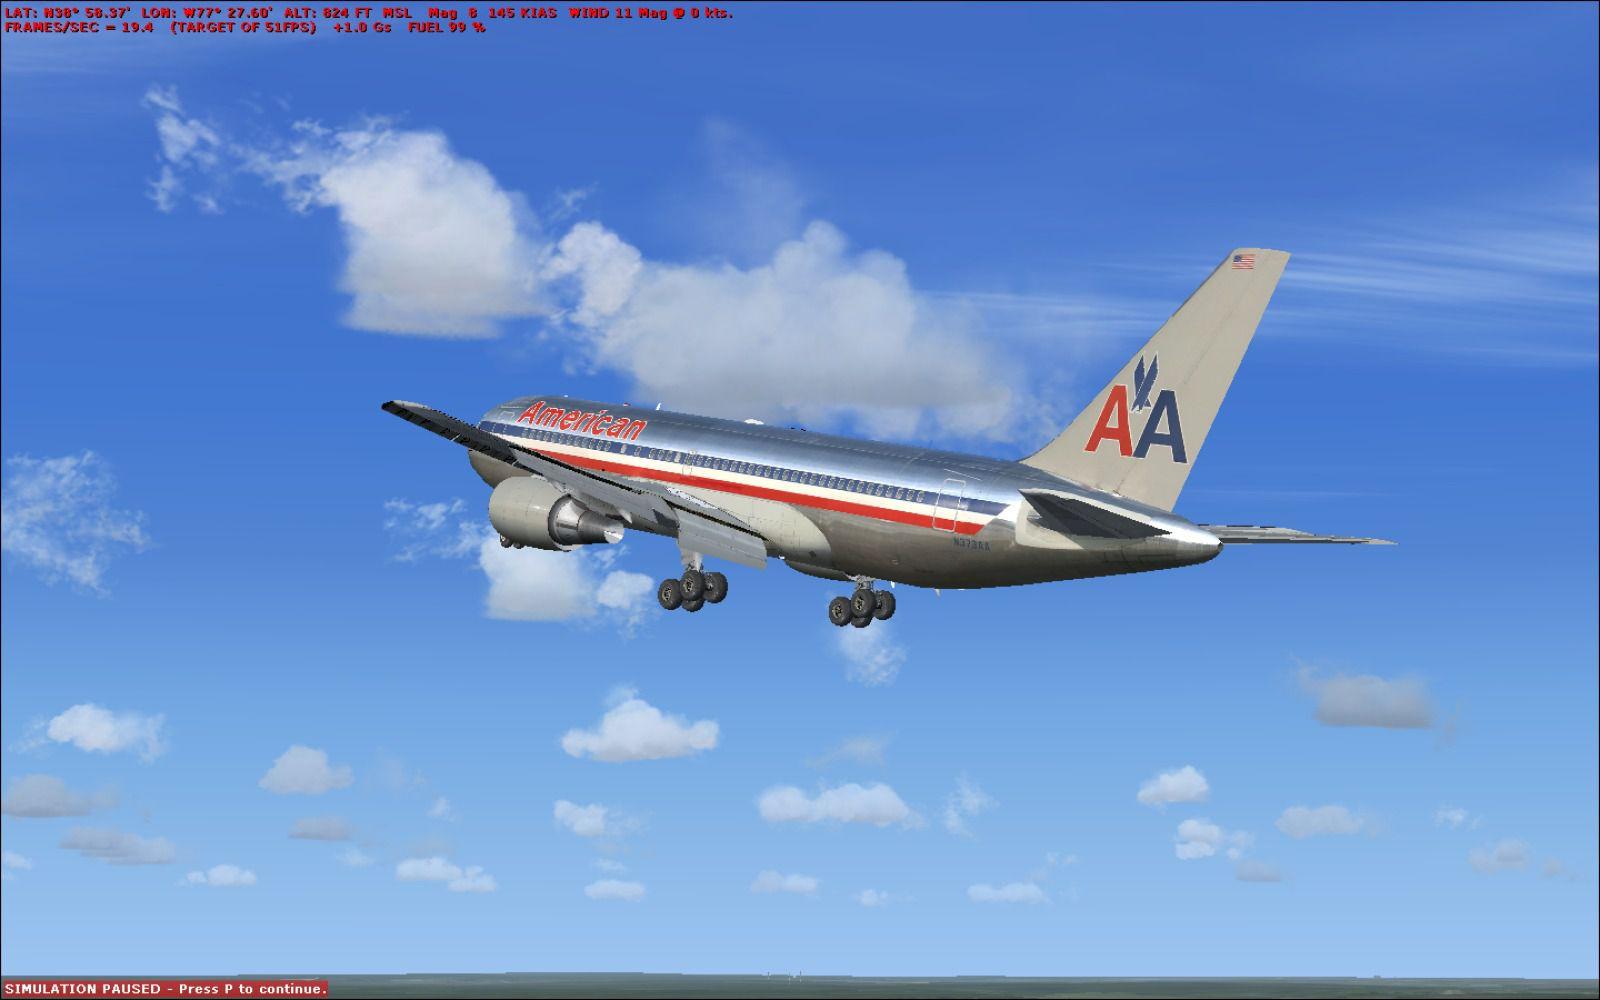 missplaced or damaged aviation document